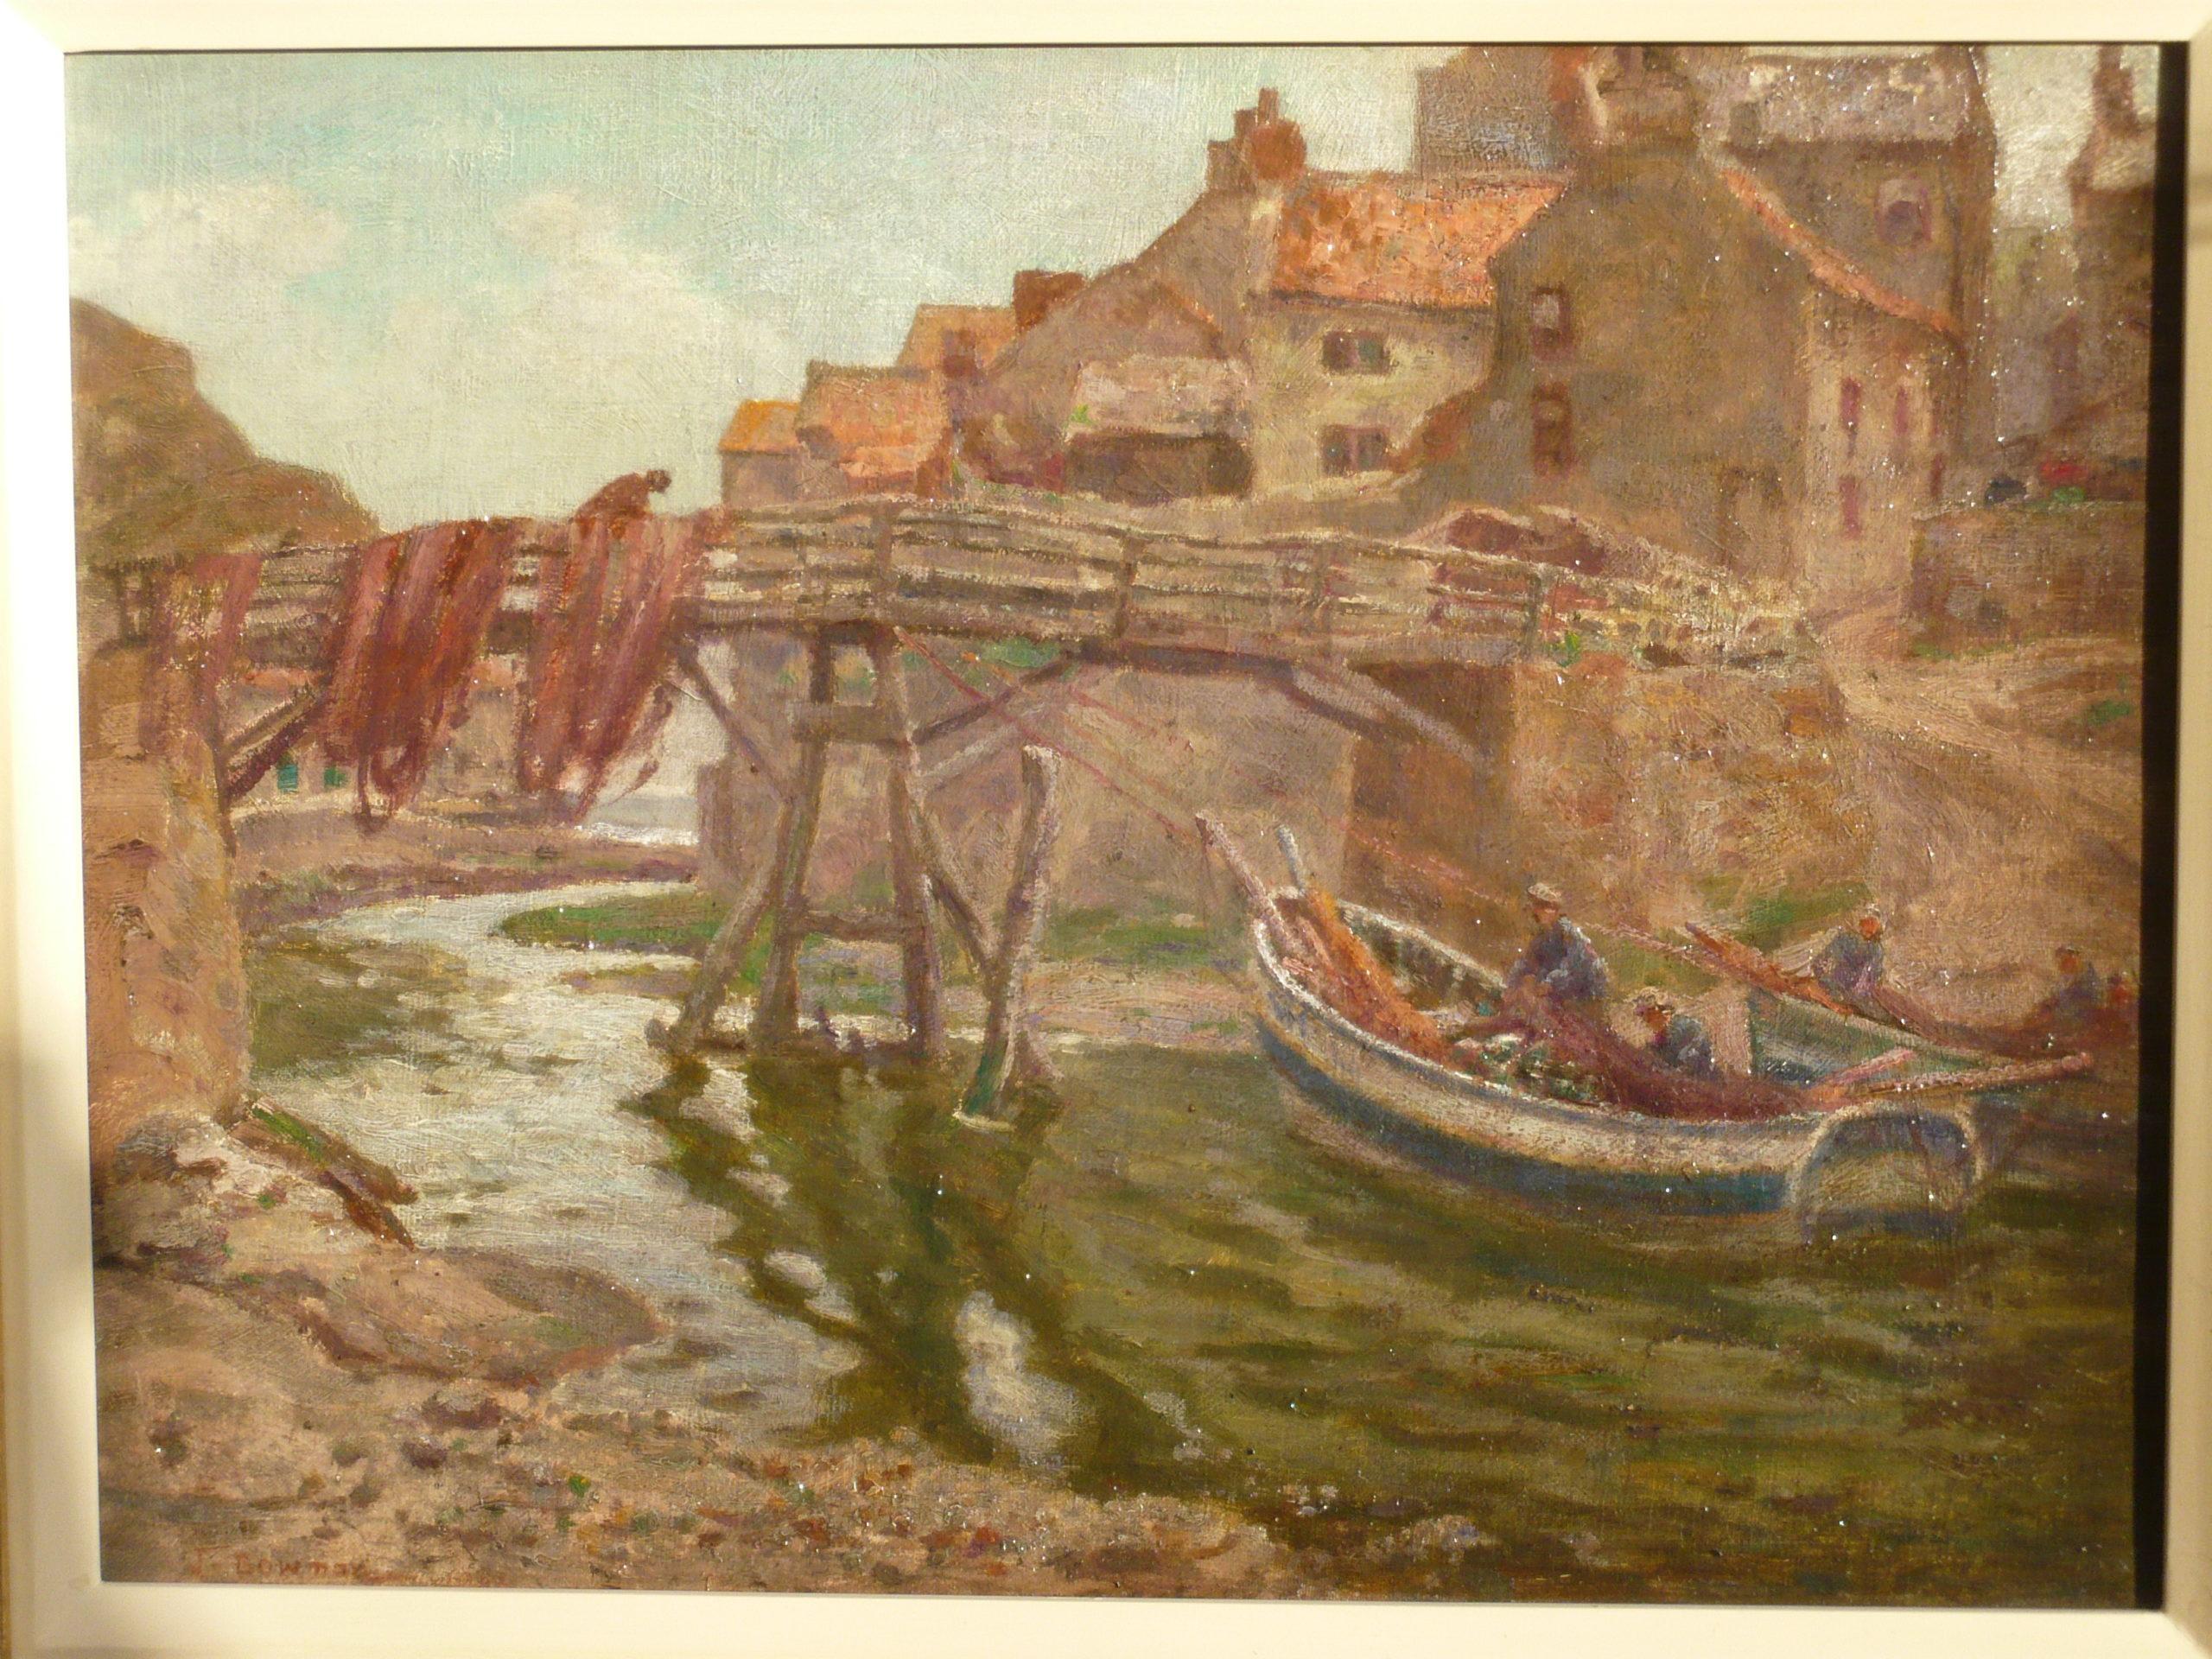 The Bridge at Staithes (1902), by John Bowman